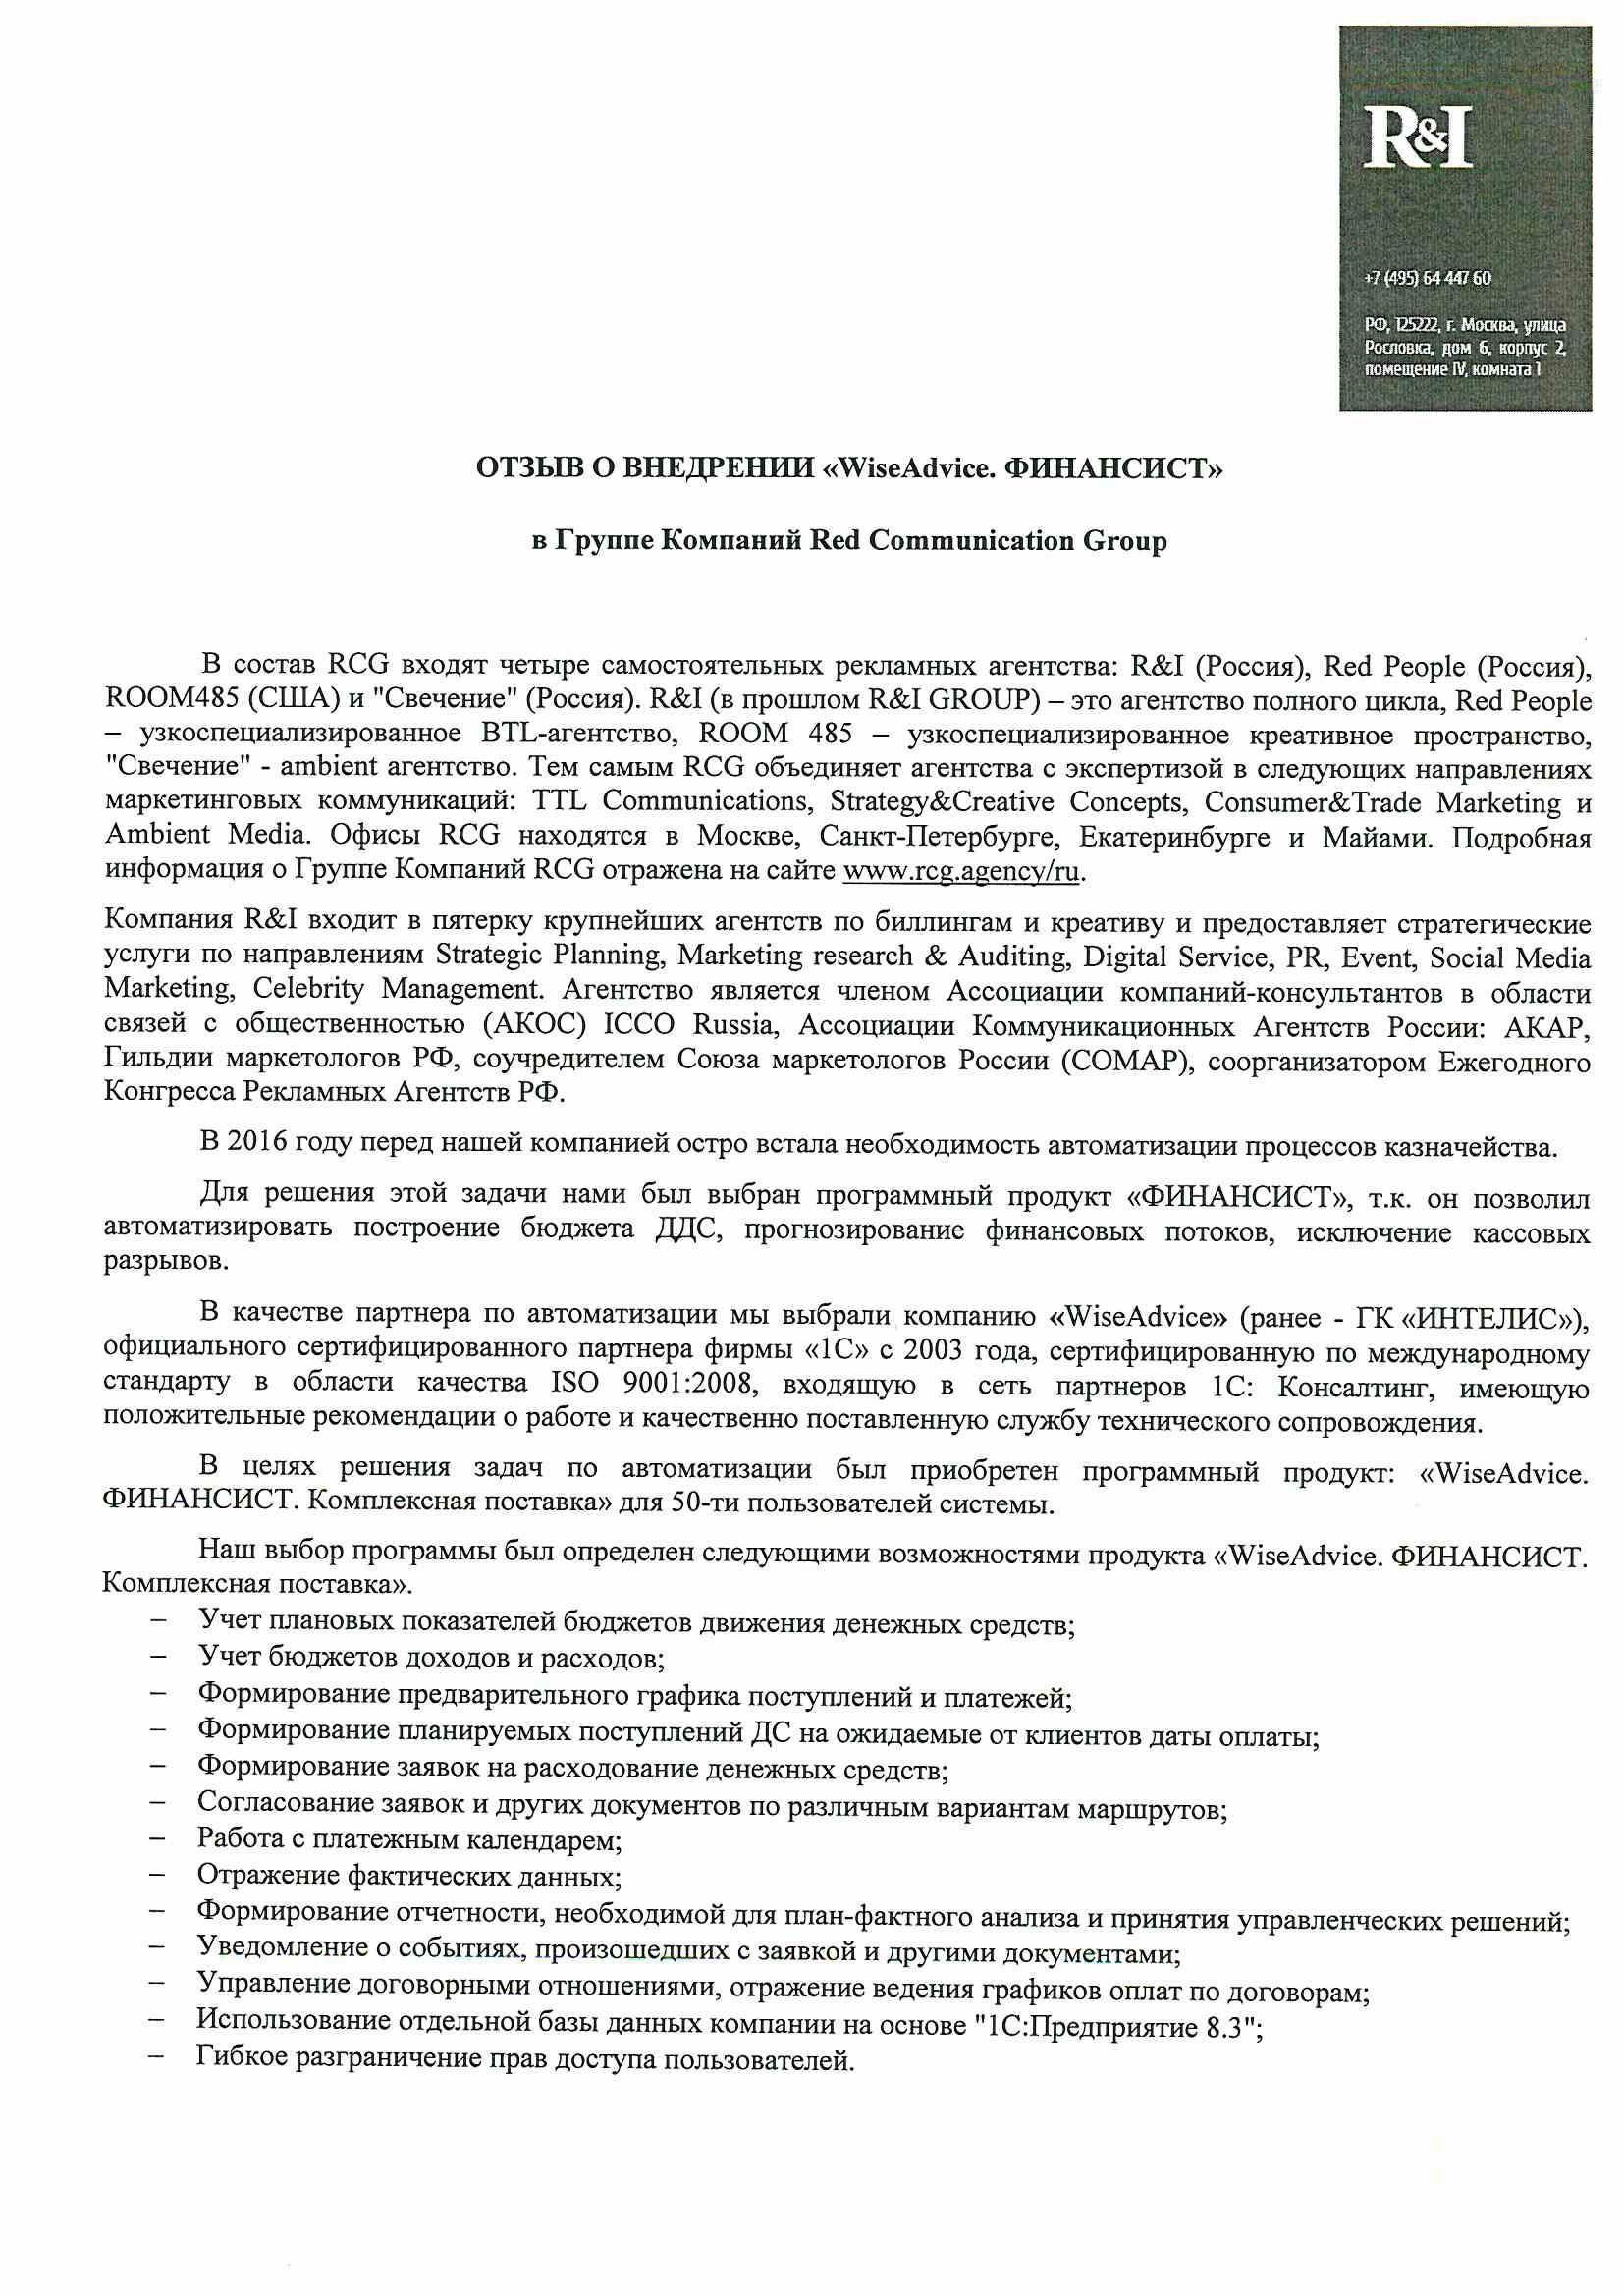 ДИВАЙС / RED COMMUNICATION GROUP отзыв